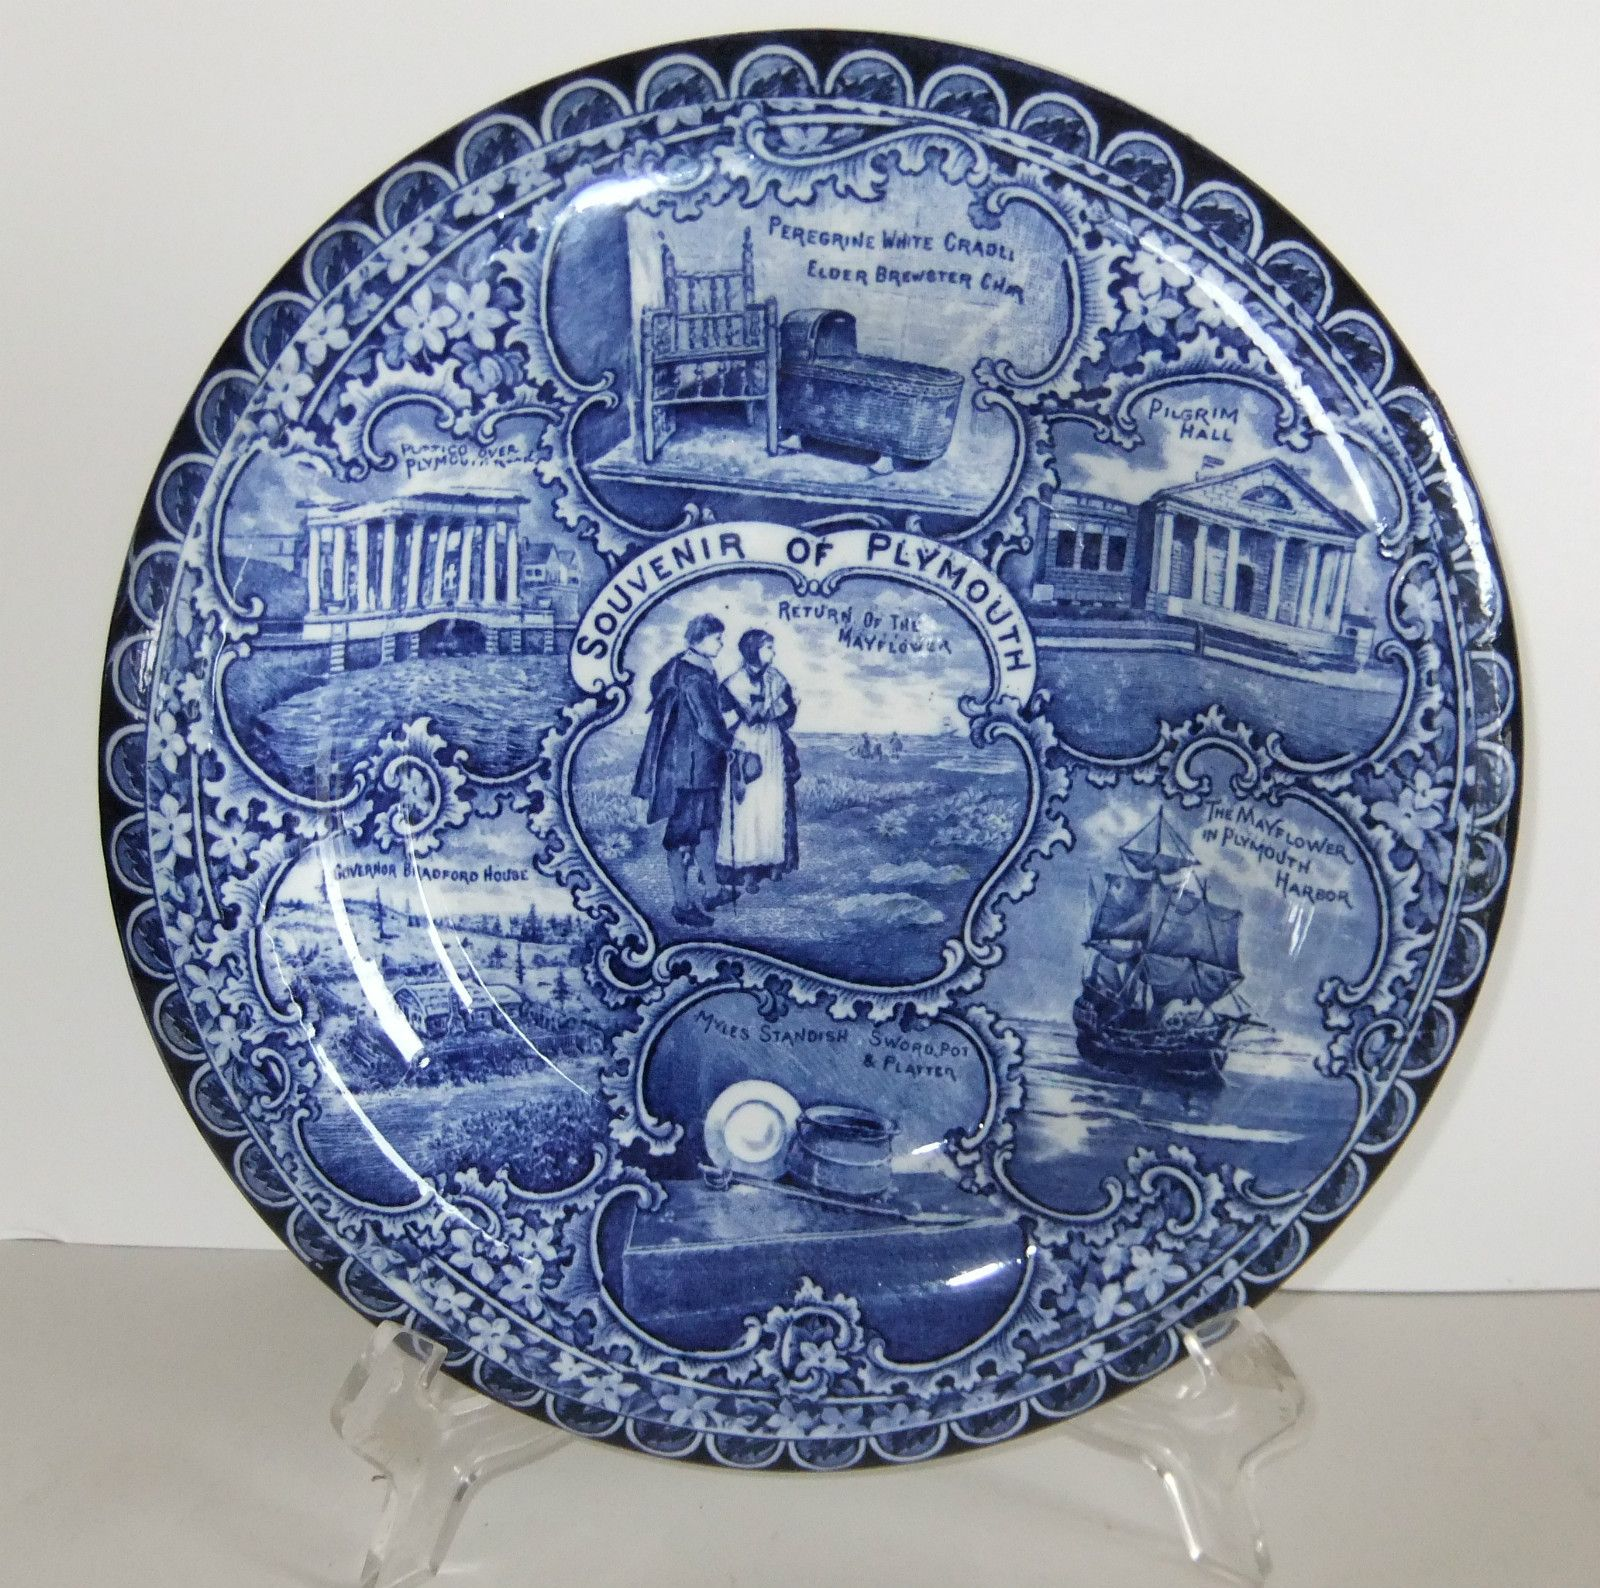 Antique A s Burbank R s Souvenir Flow Blue Plate Rolled Rim Plymouth Mass 1907 | eBay